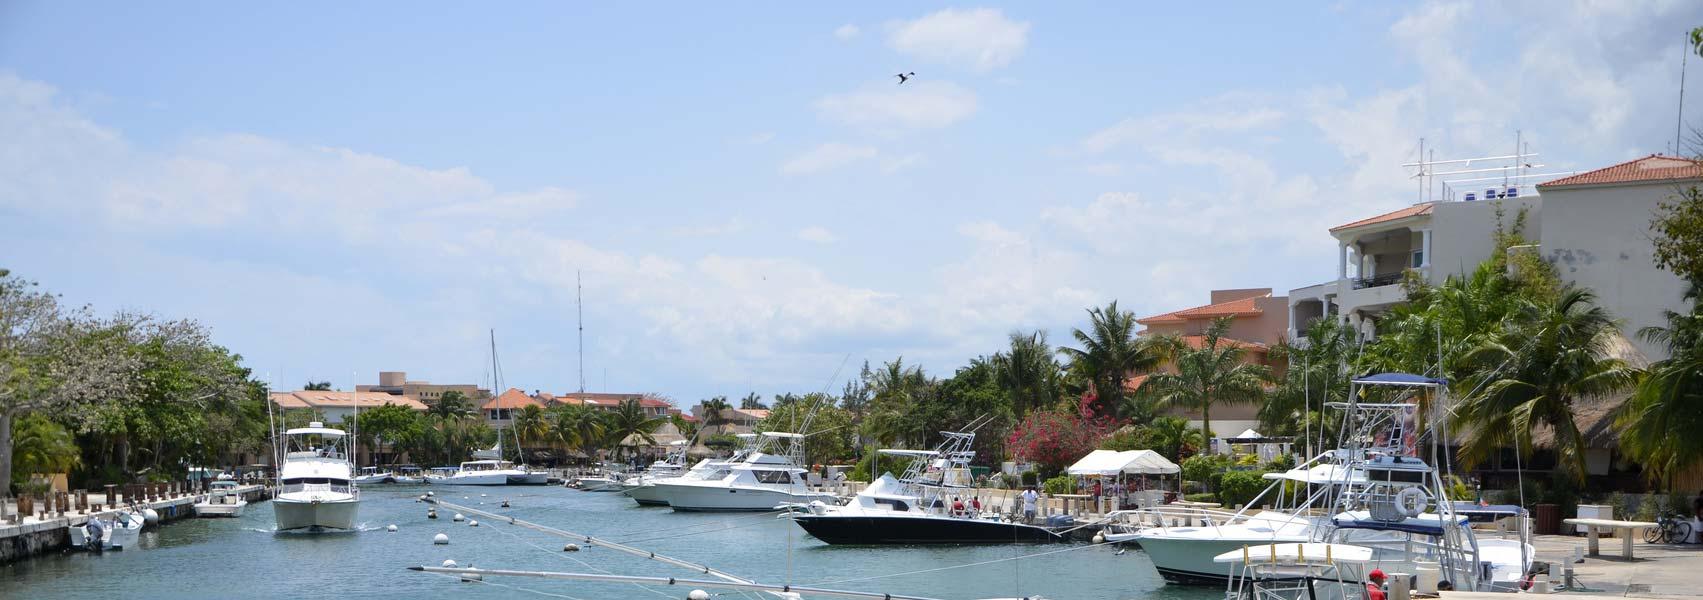 Puerto Aventuras Mexico